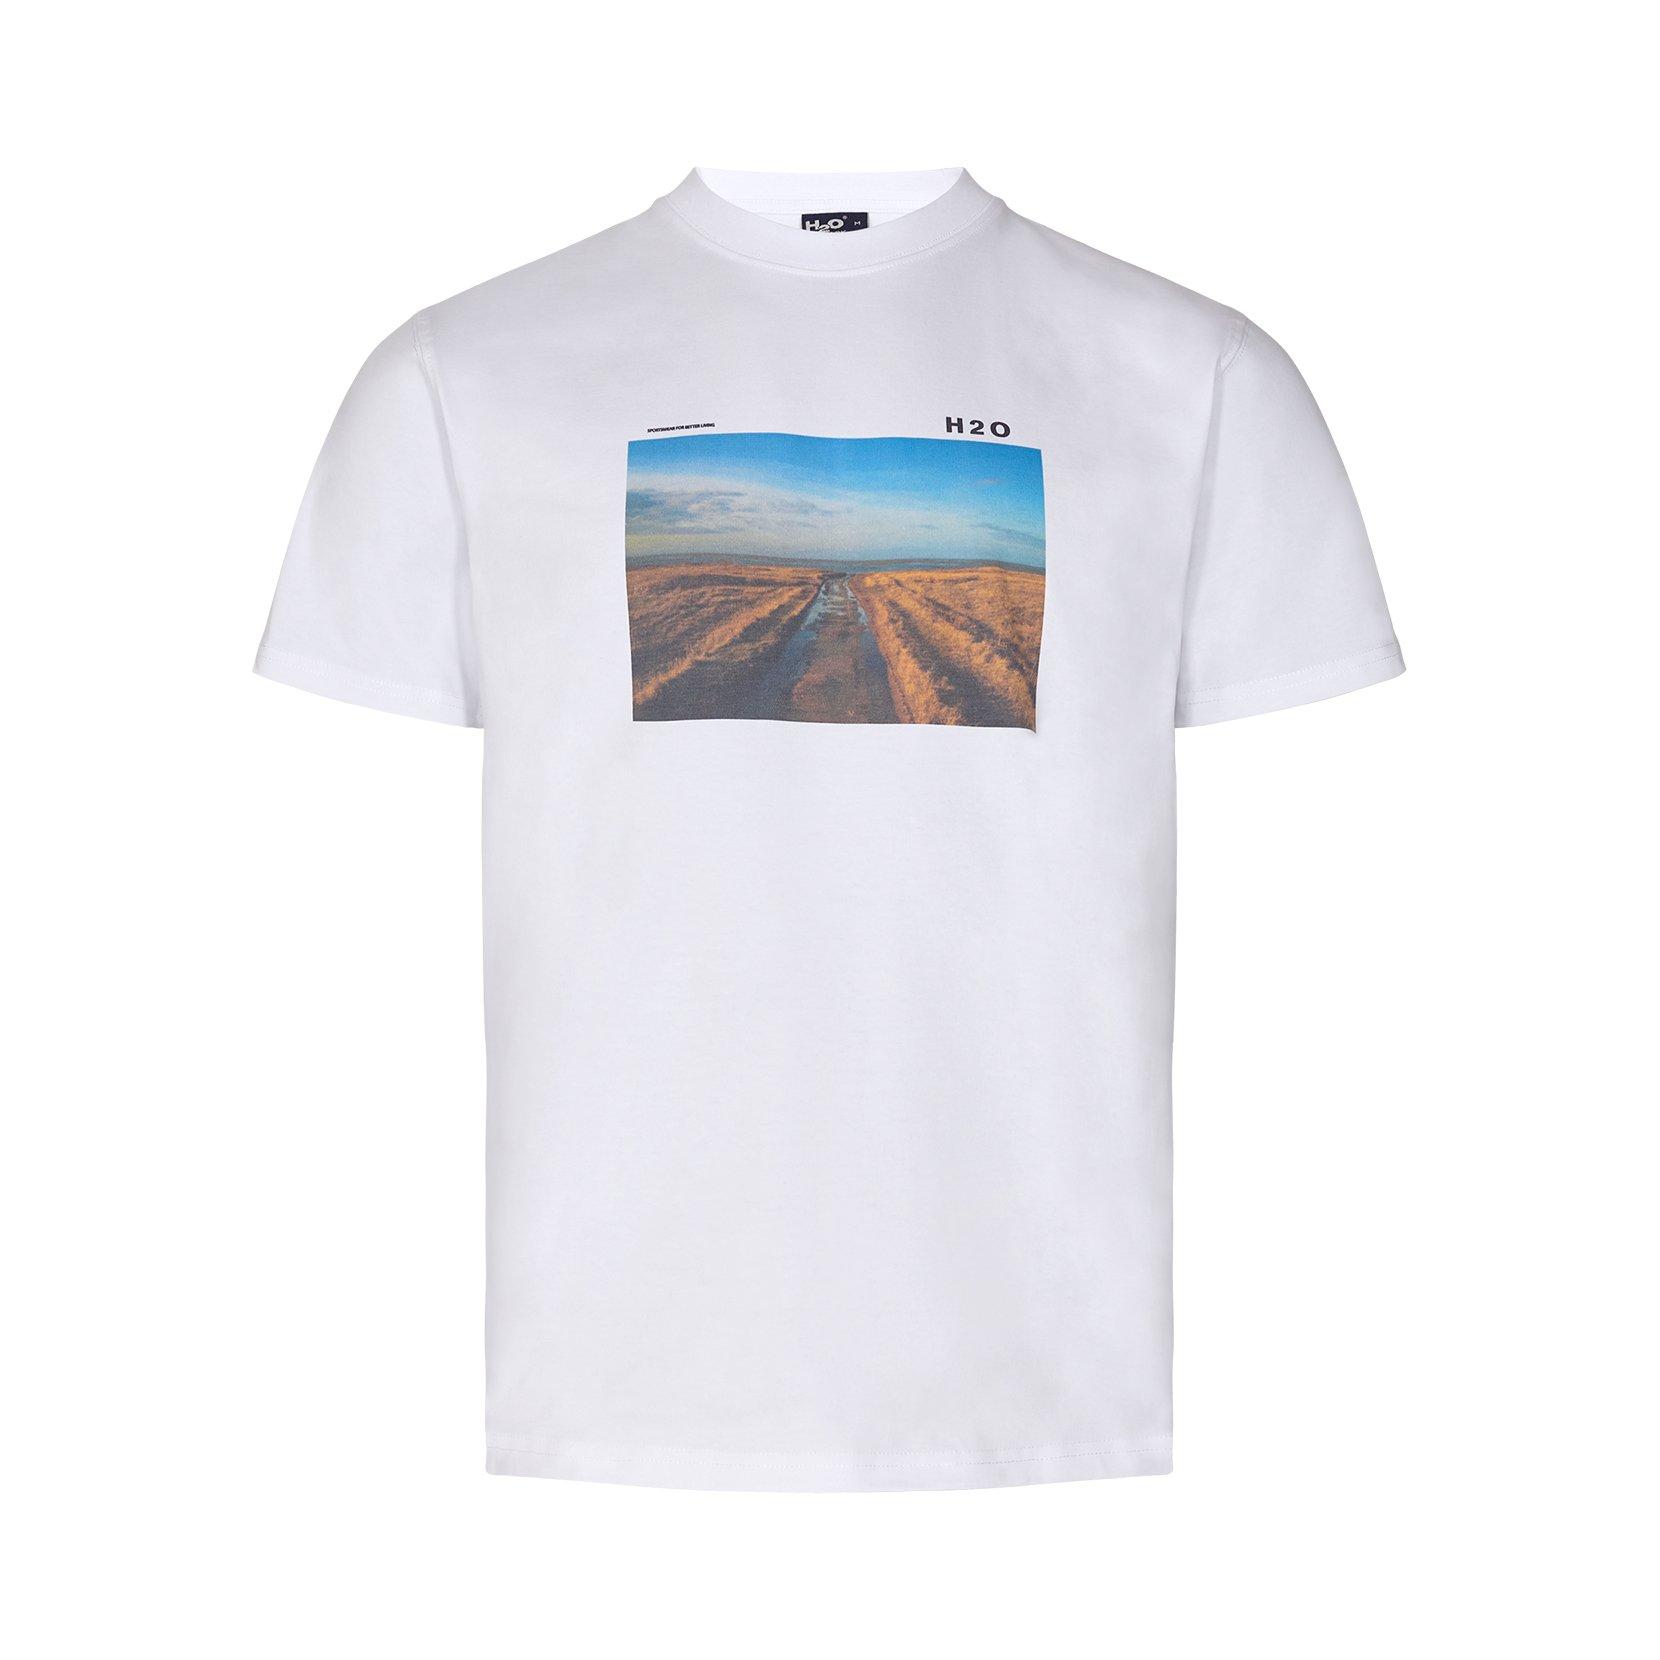 H2O Lilleø SS t-shirt, white/red, x-large